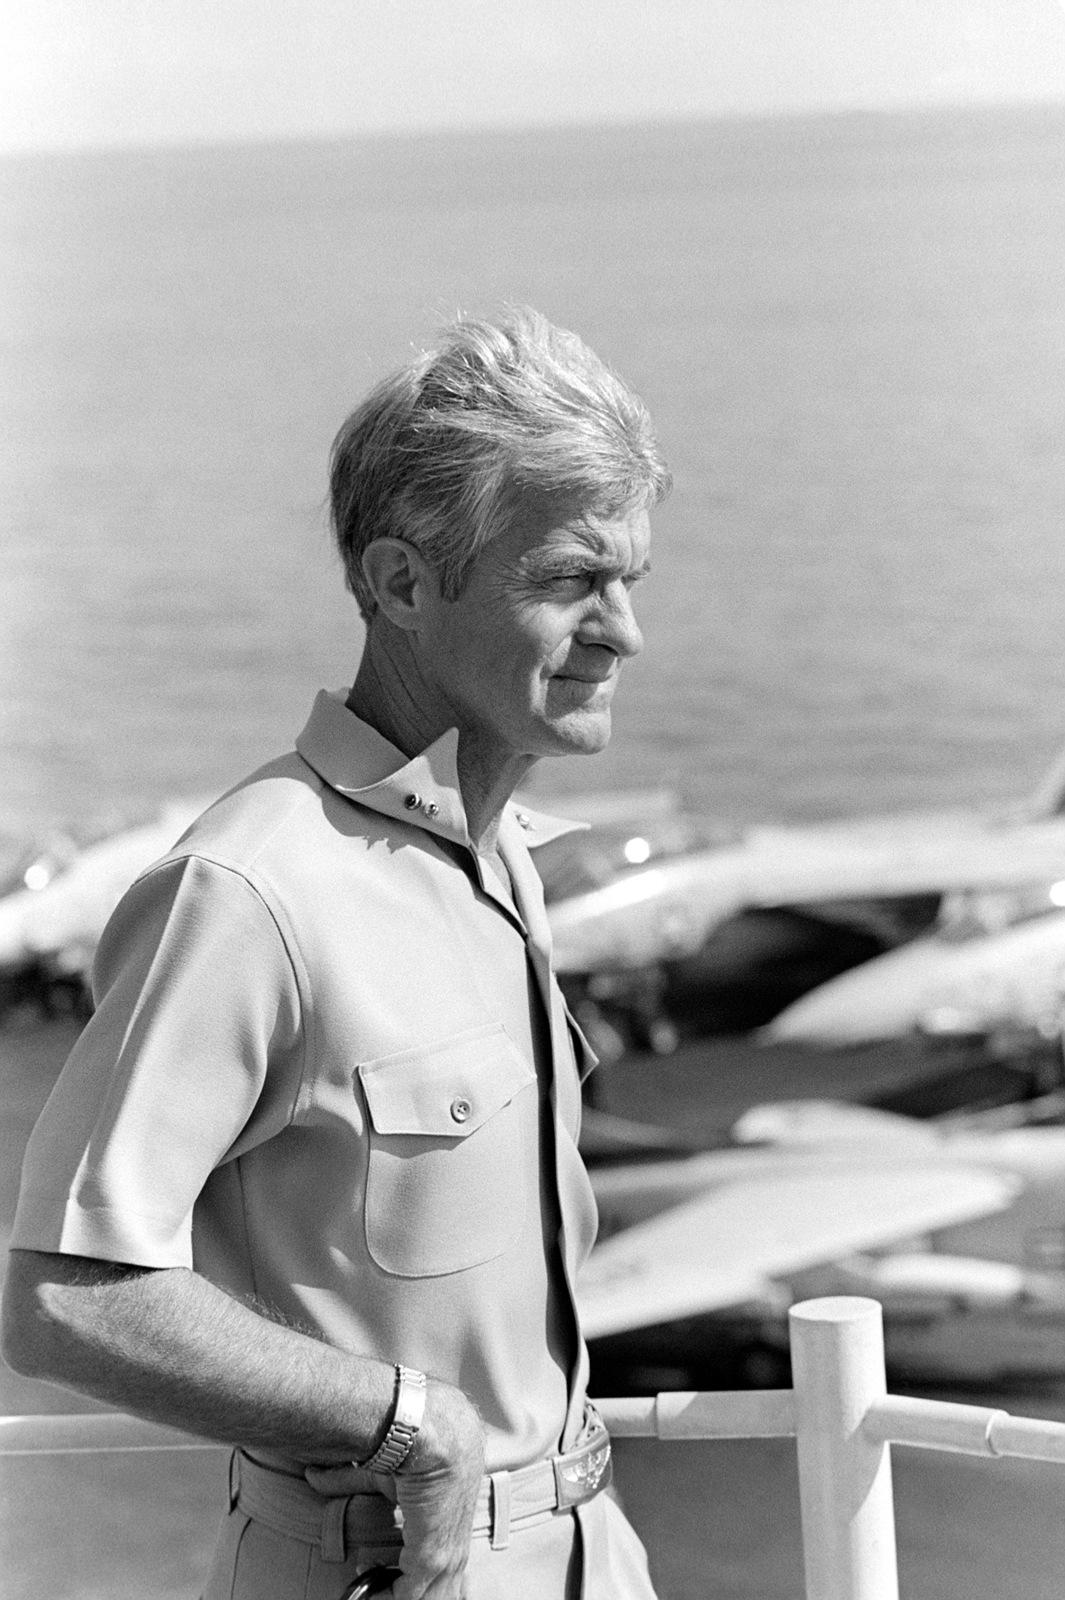 Rear Admiral (RADM) Robert E. Kirksey, commander, Task Force 77, observes flight deck operations from the 0-10 level aboard the aircraft carrier USS KITTY HAWK (CV 63)